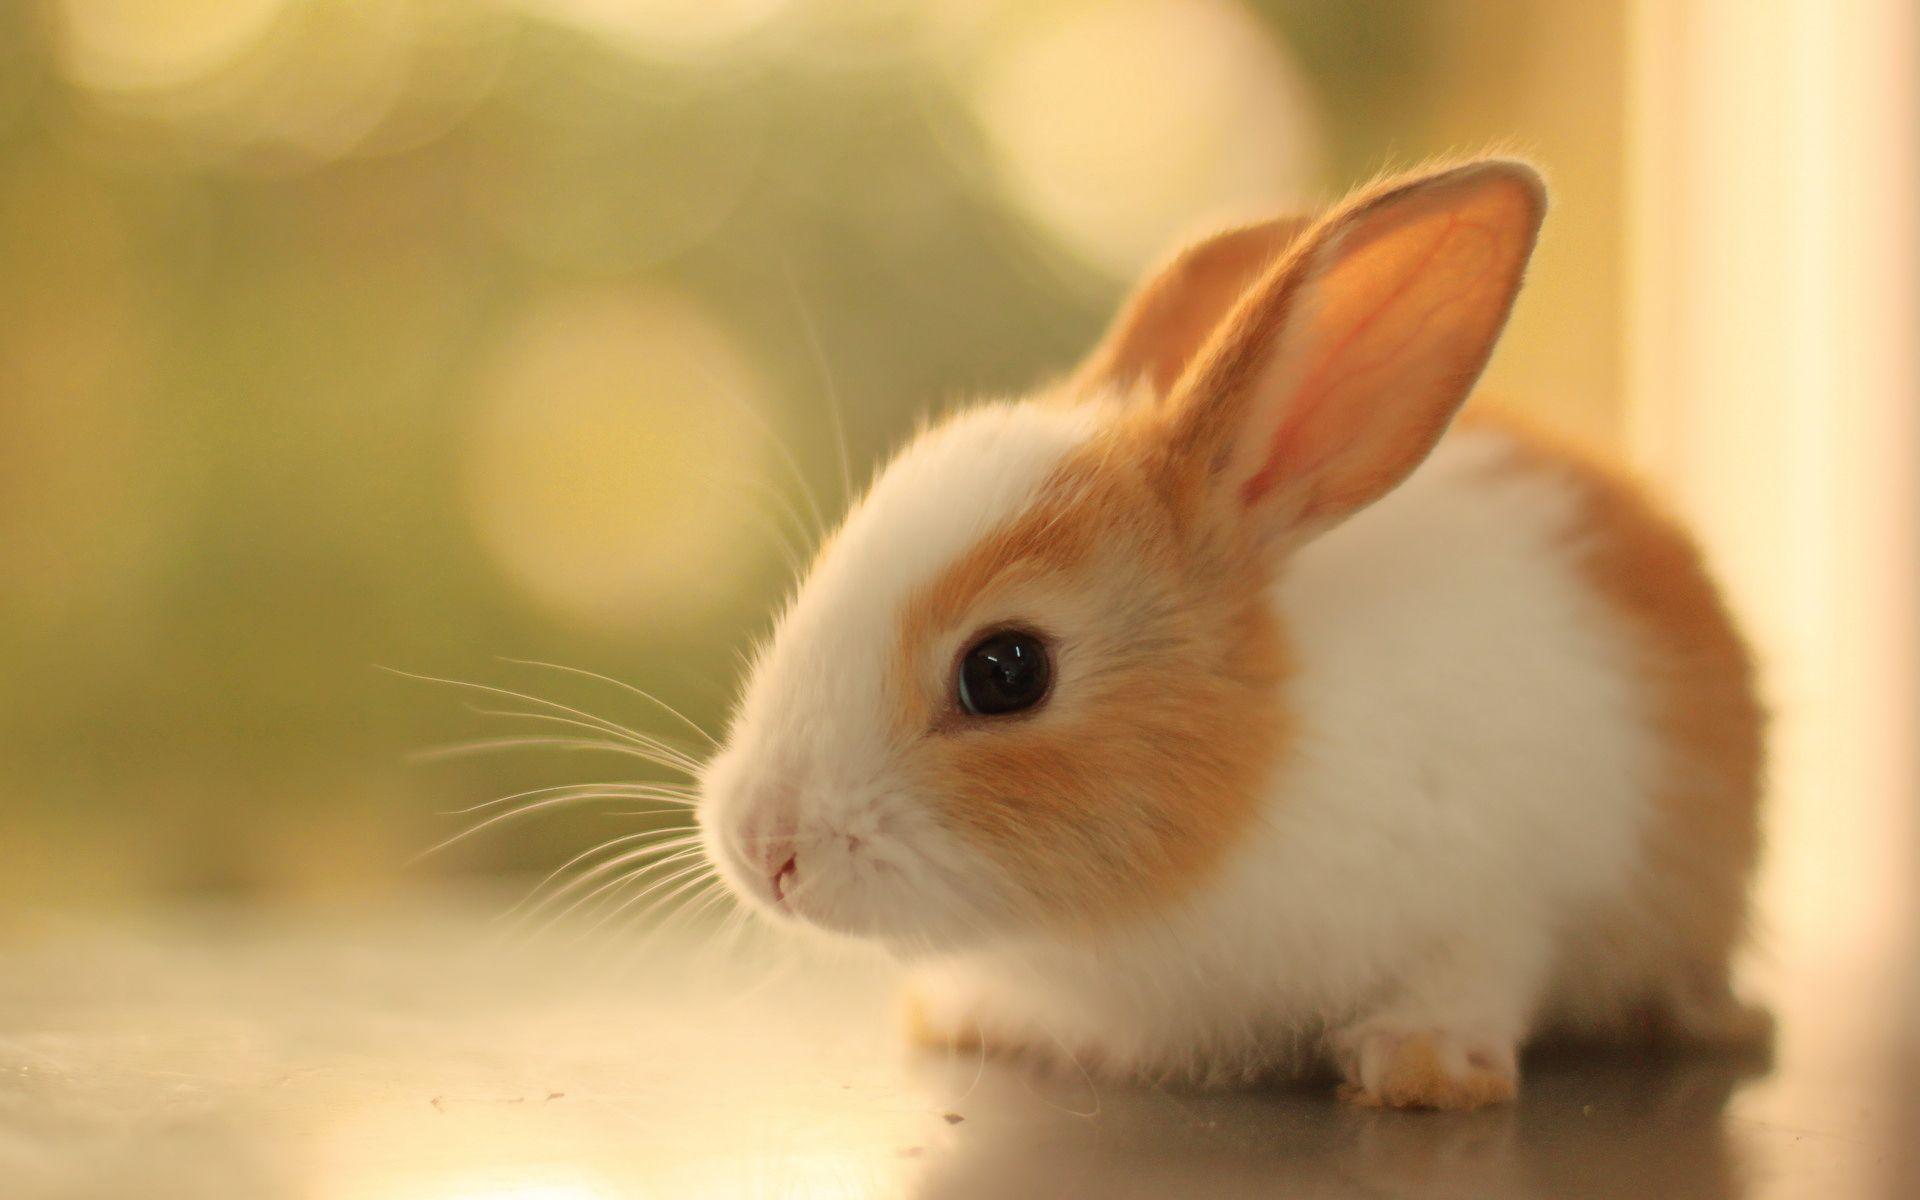 Cute Baby Rabbits Cute Kawaii Animals Rabbit Wallpaper Animal Wallpaper